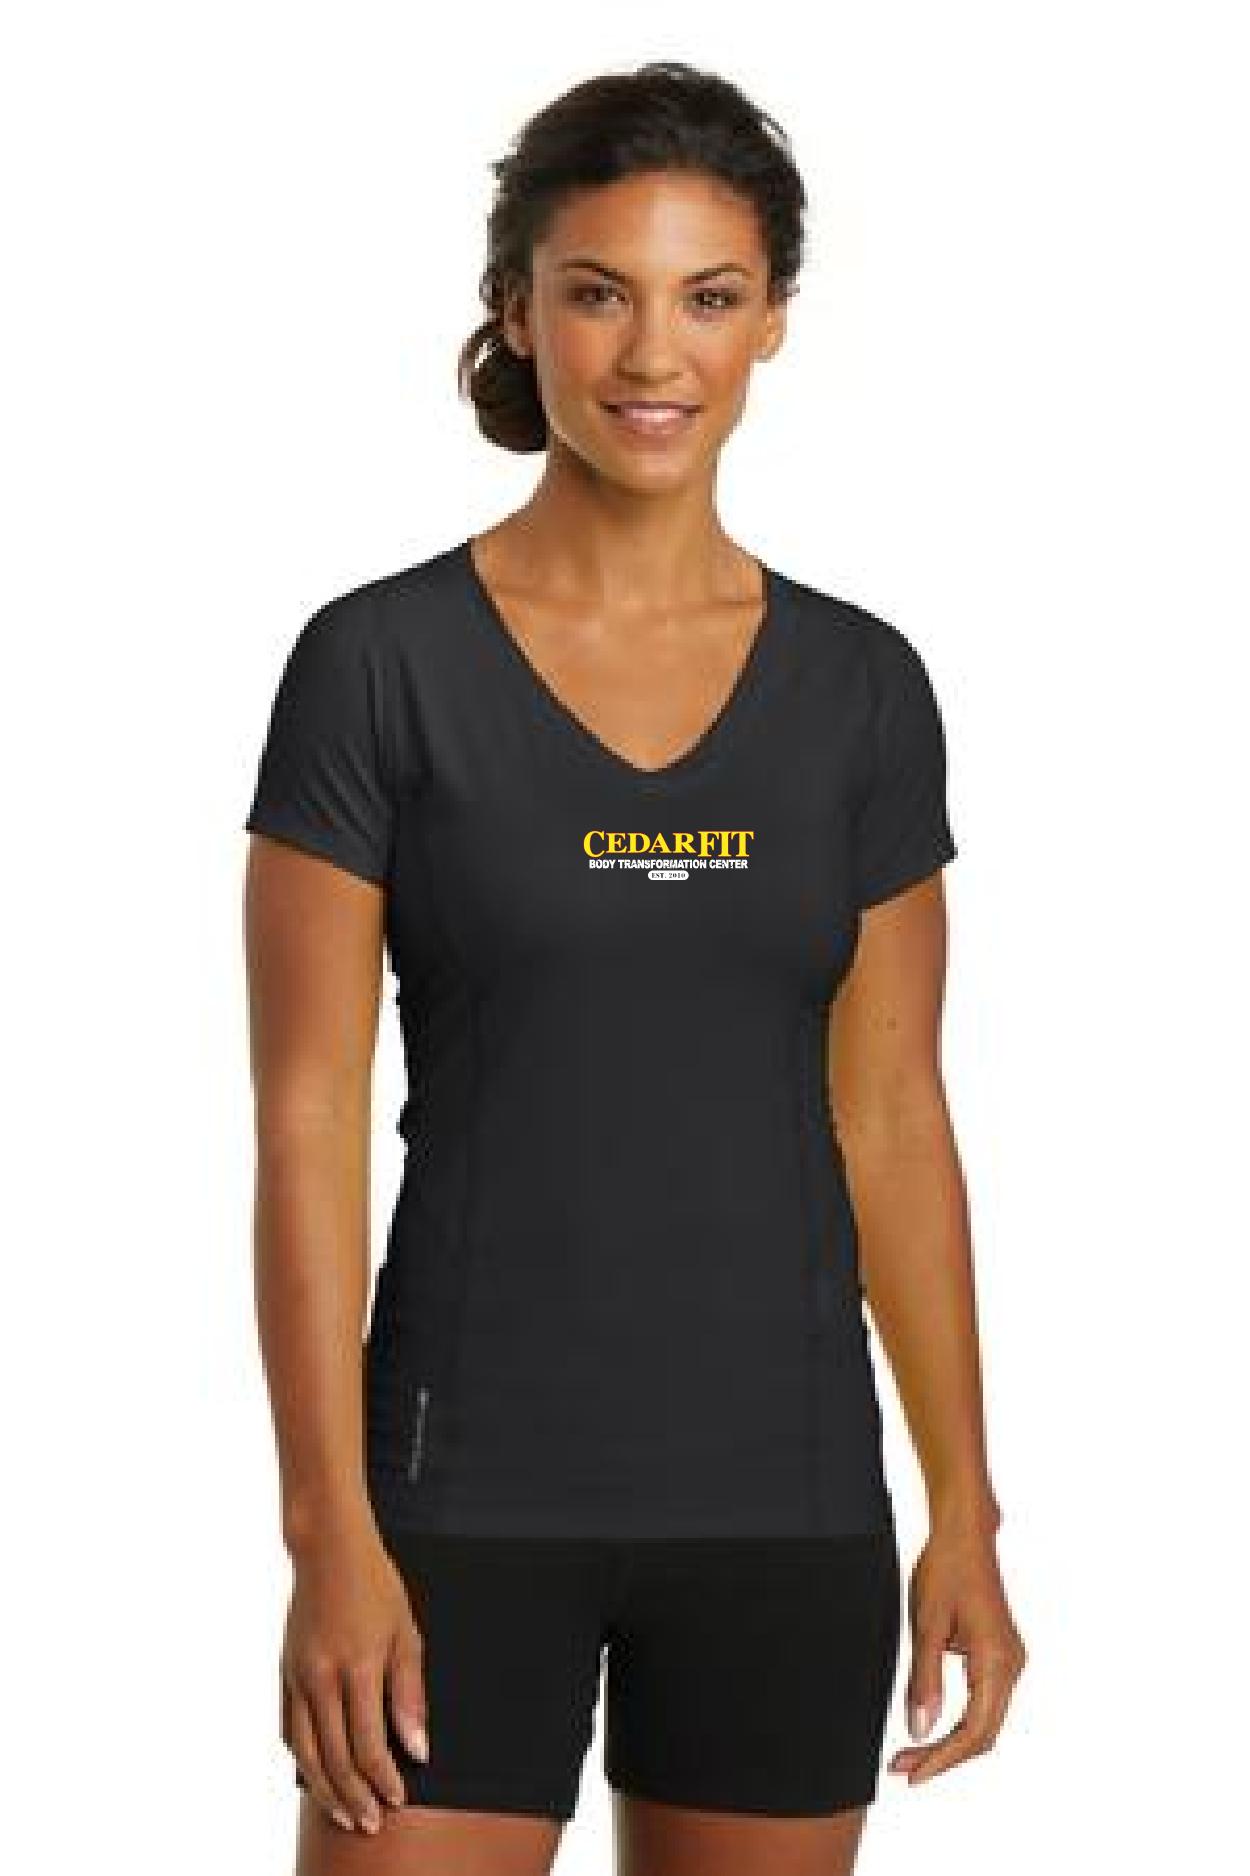 Cedar Fit OGIO® ENDURANCE Ladies Nexus V-Neck.-OGIO